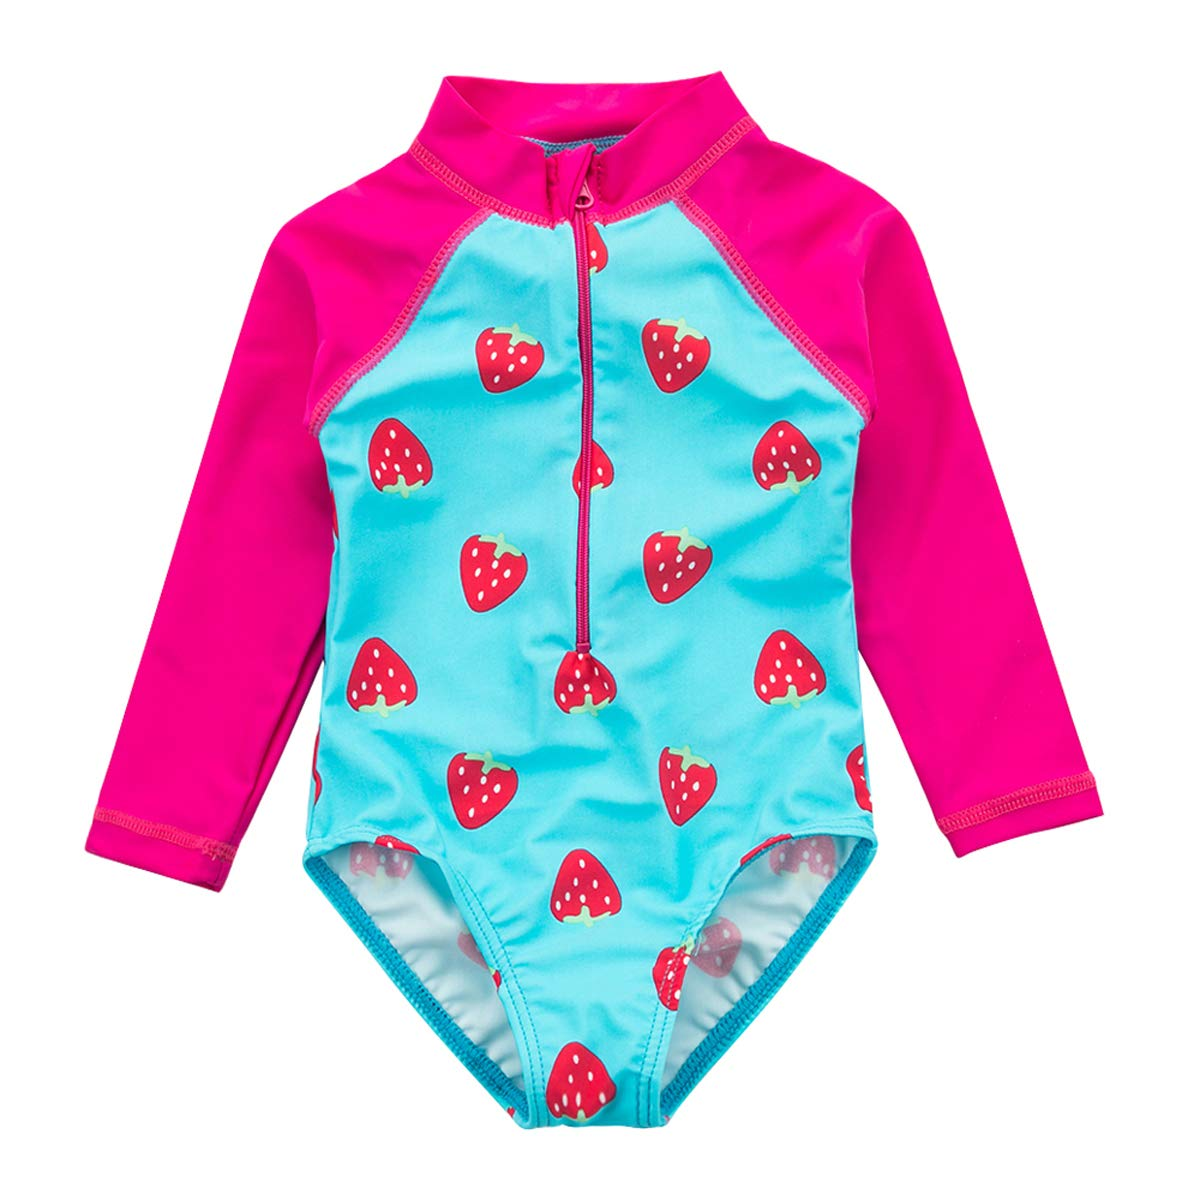 Wishere Baby Girl Sunsuit One-Piece Swimsuit Rash Guard Swimwear